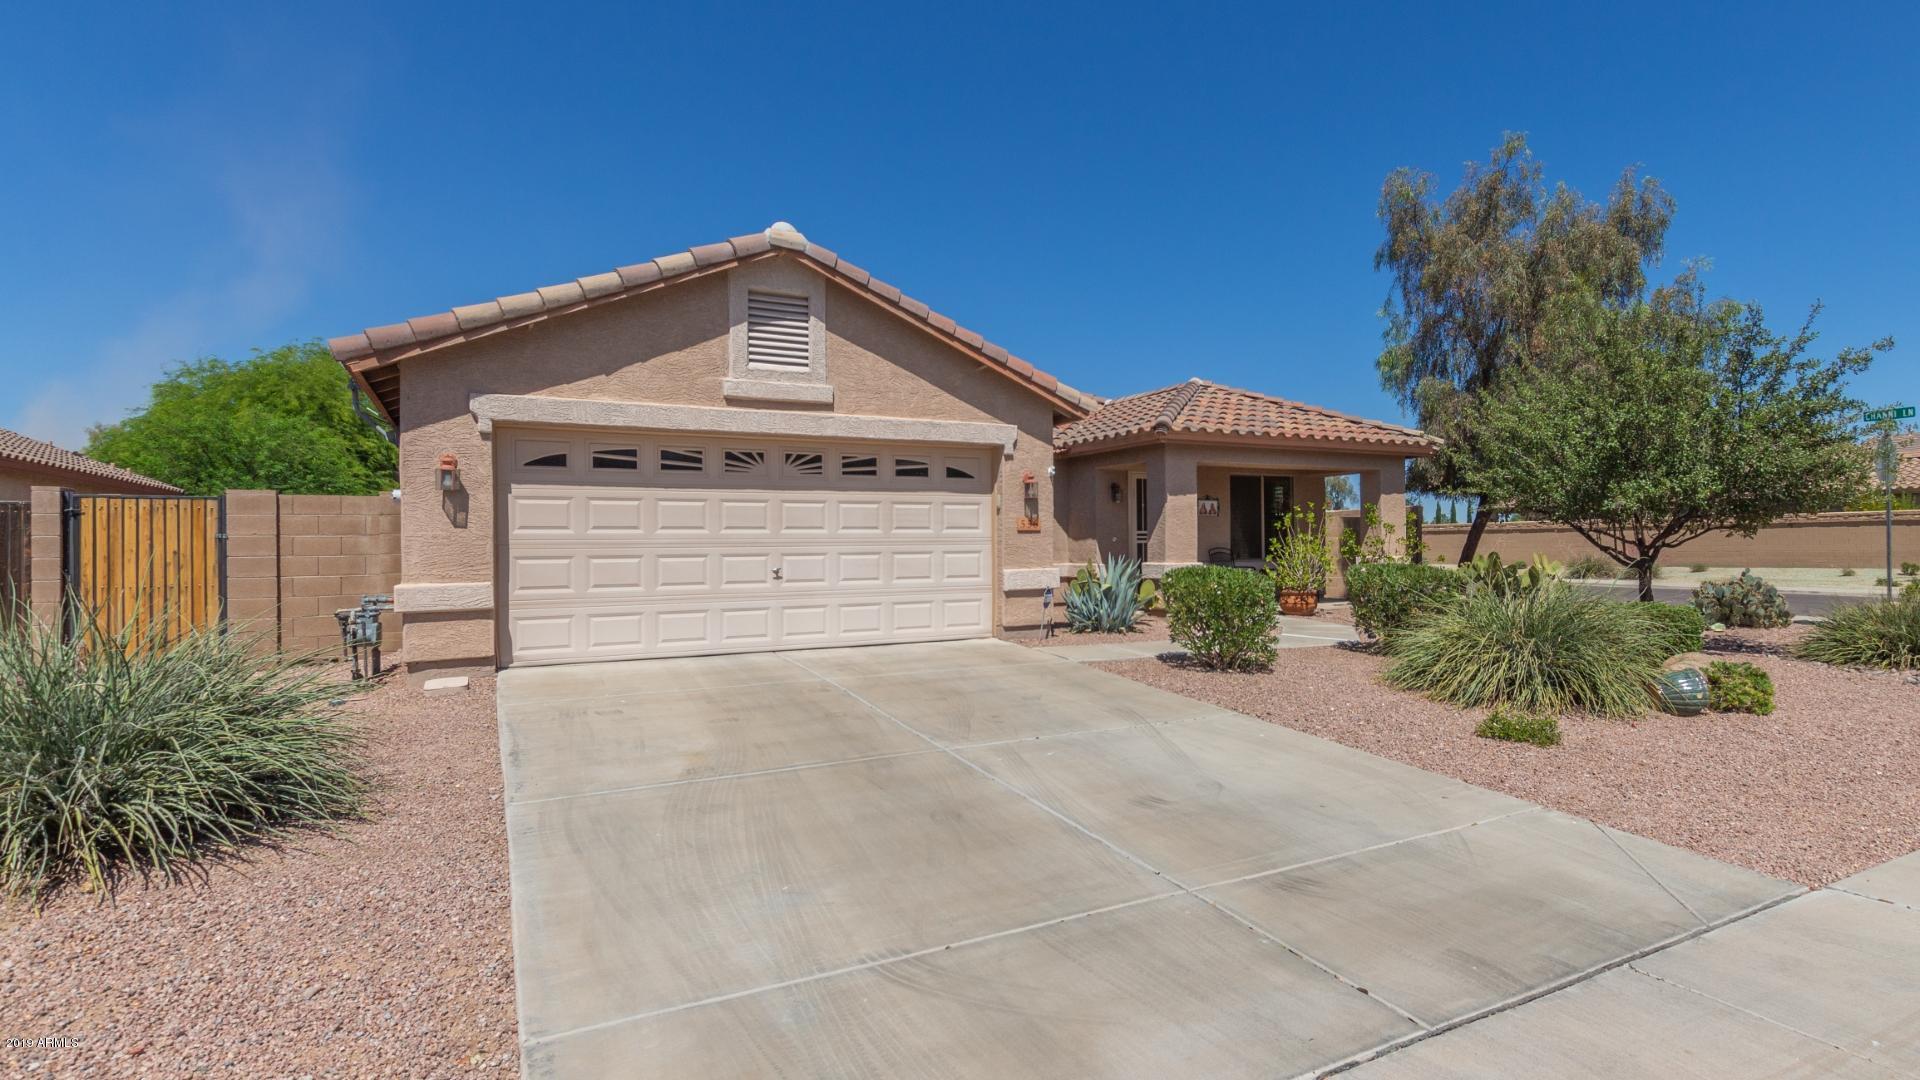 Photo of 556 W HEREFORD Drive, San Tan Valley, AZ 85143